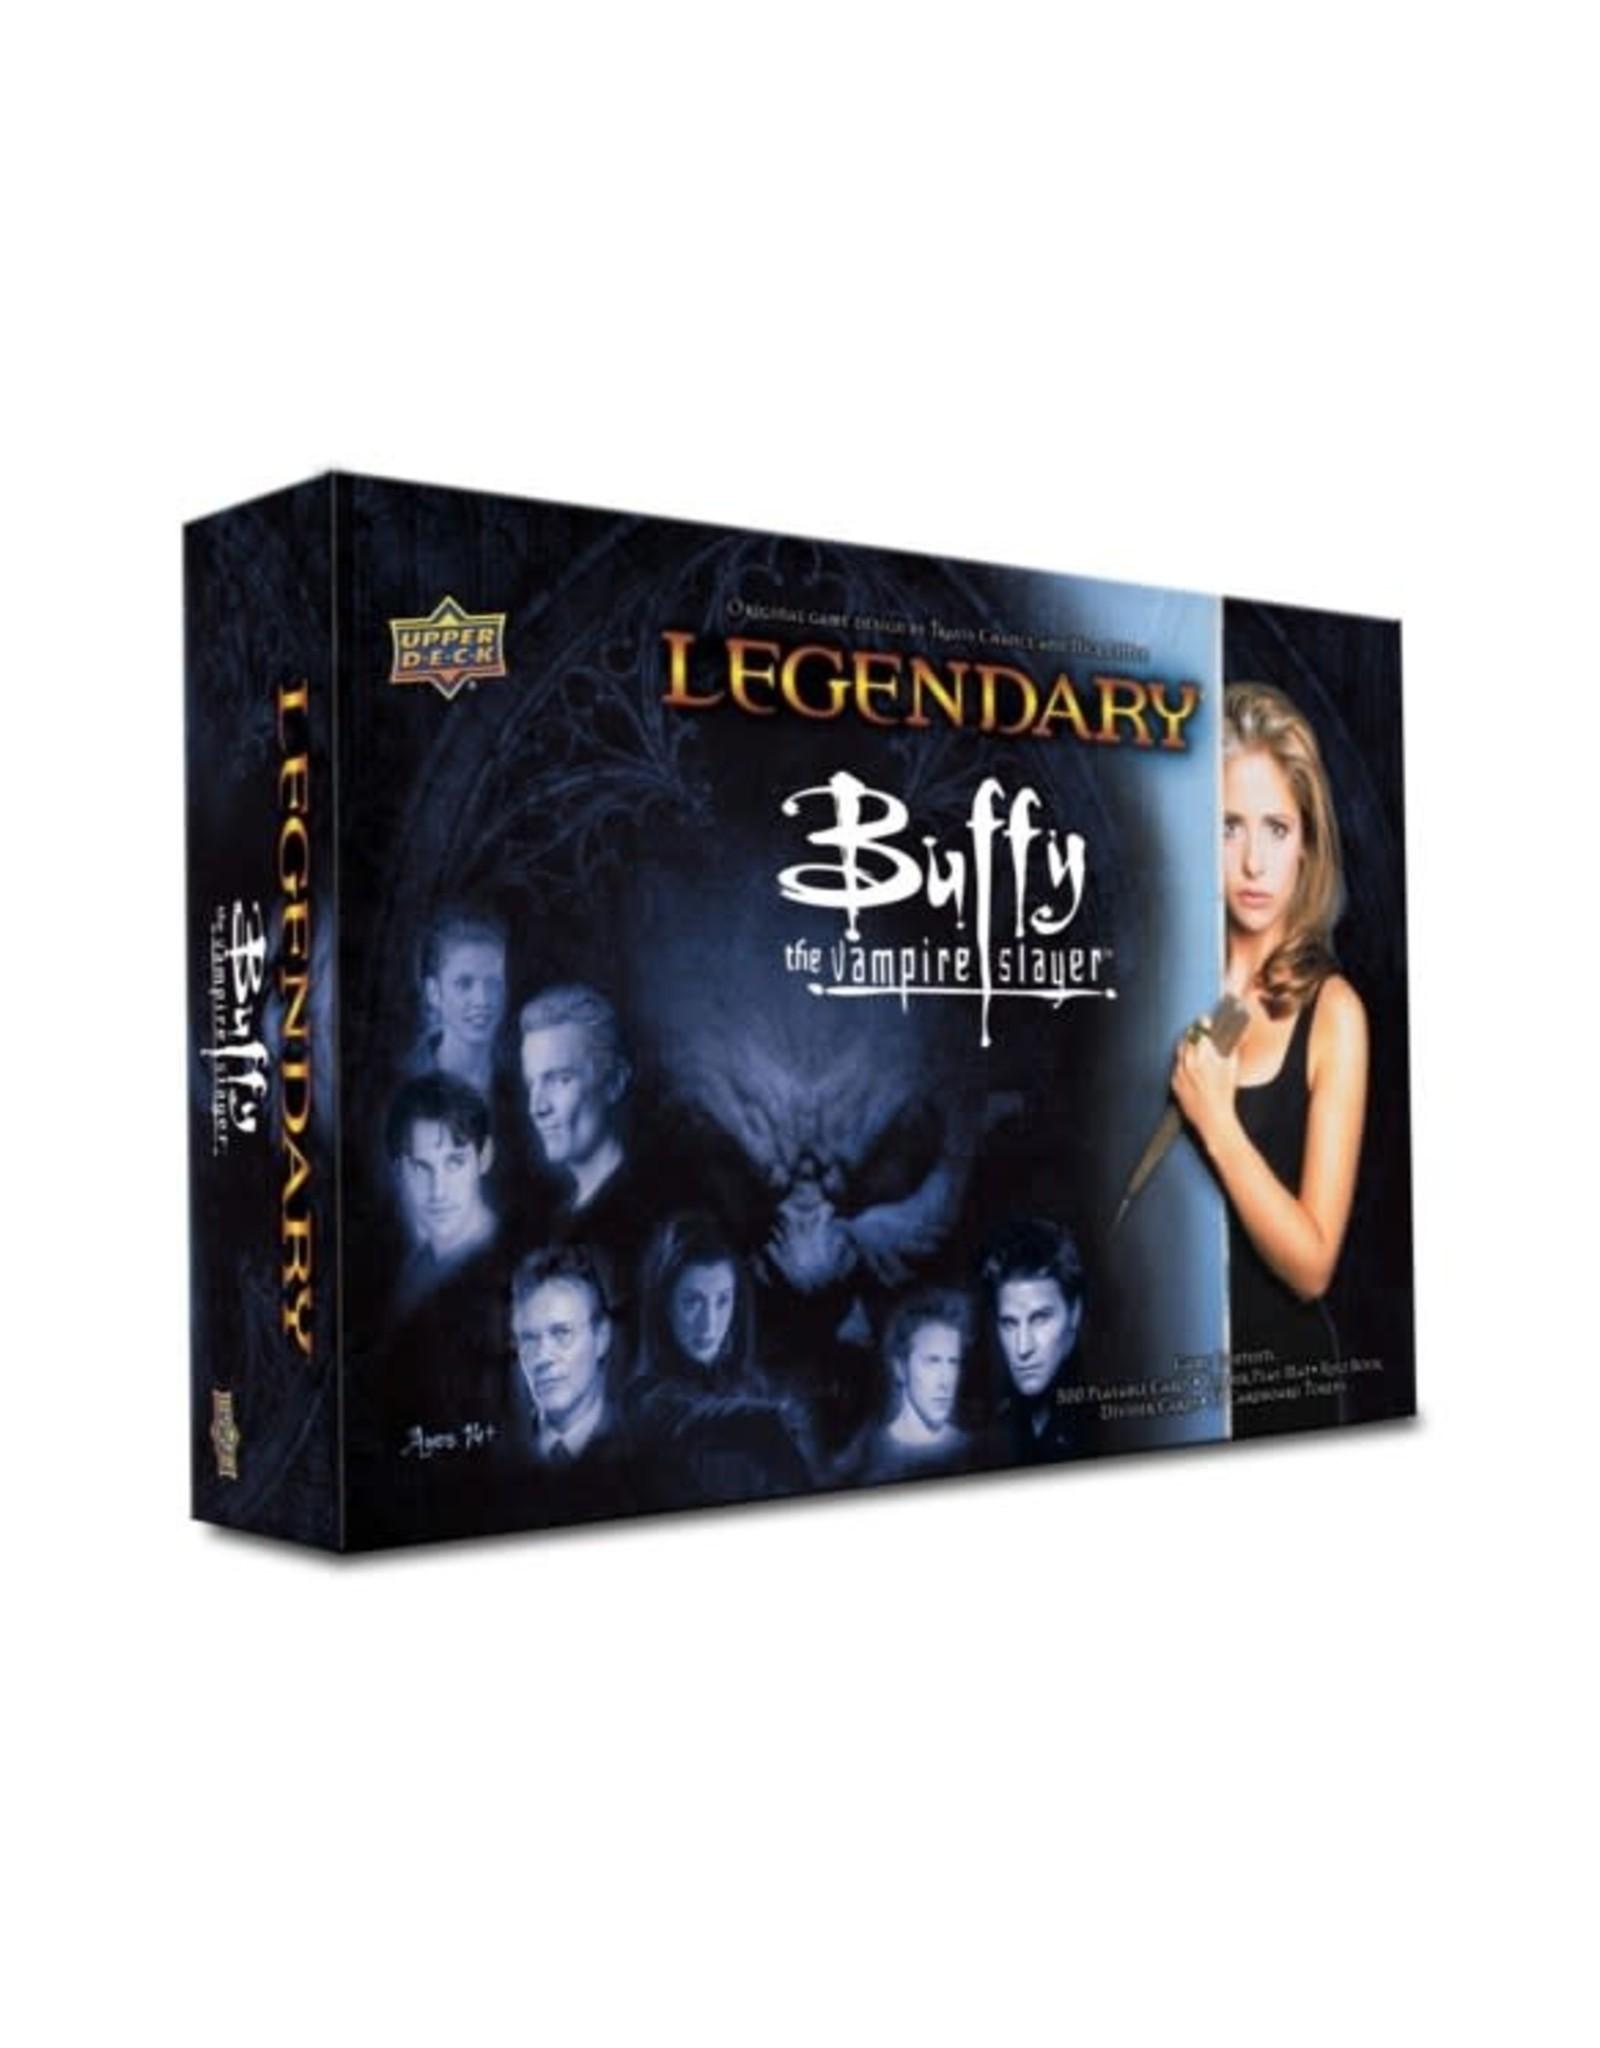 Legendary DBG: Buffy the Vampire Slayer